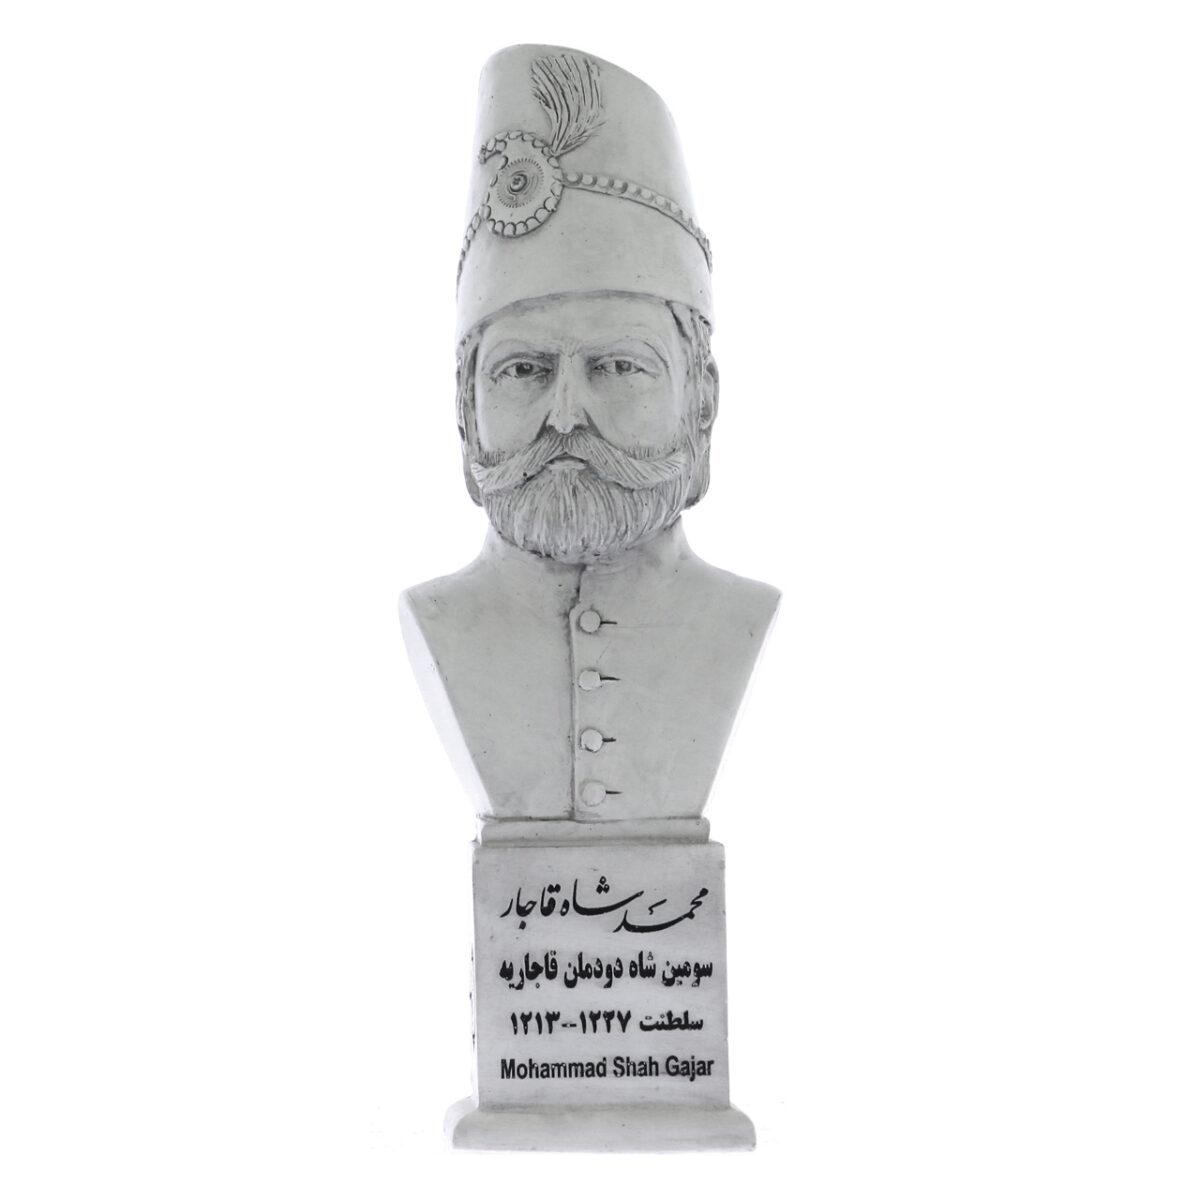 mohammad shah s 1200x1200 - سردیس محمد شاه قاجار